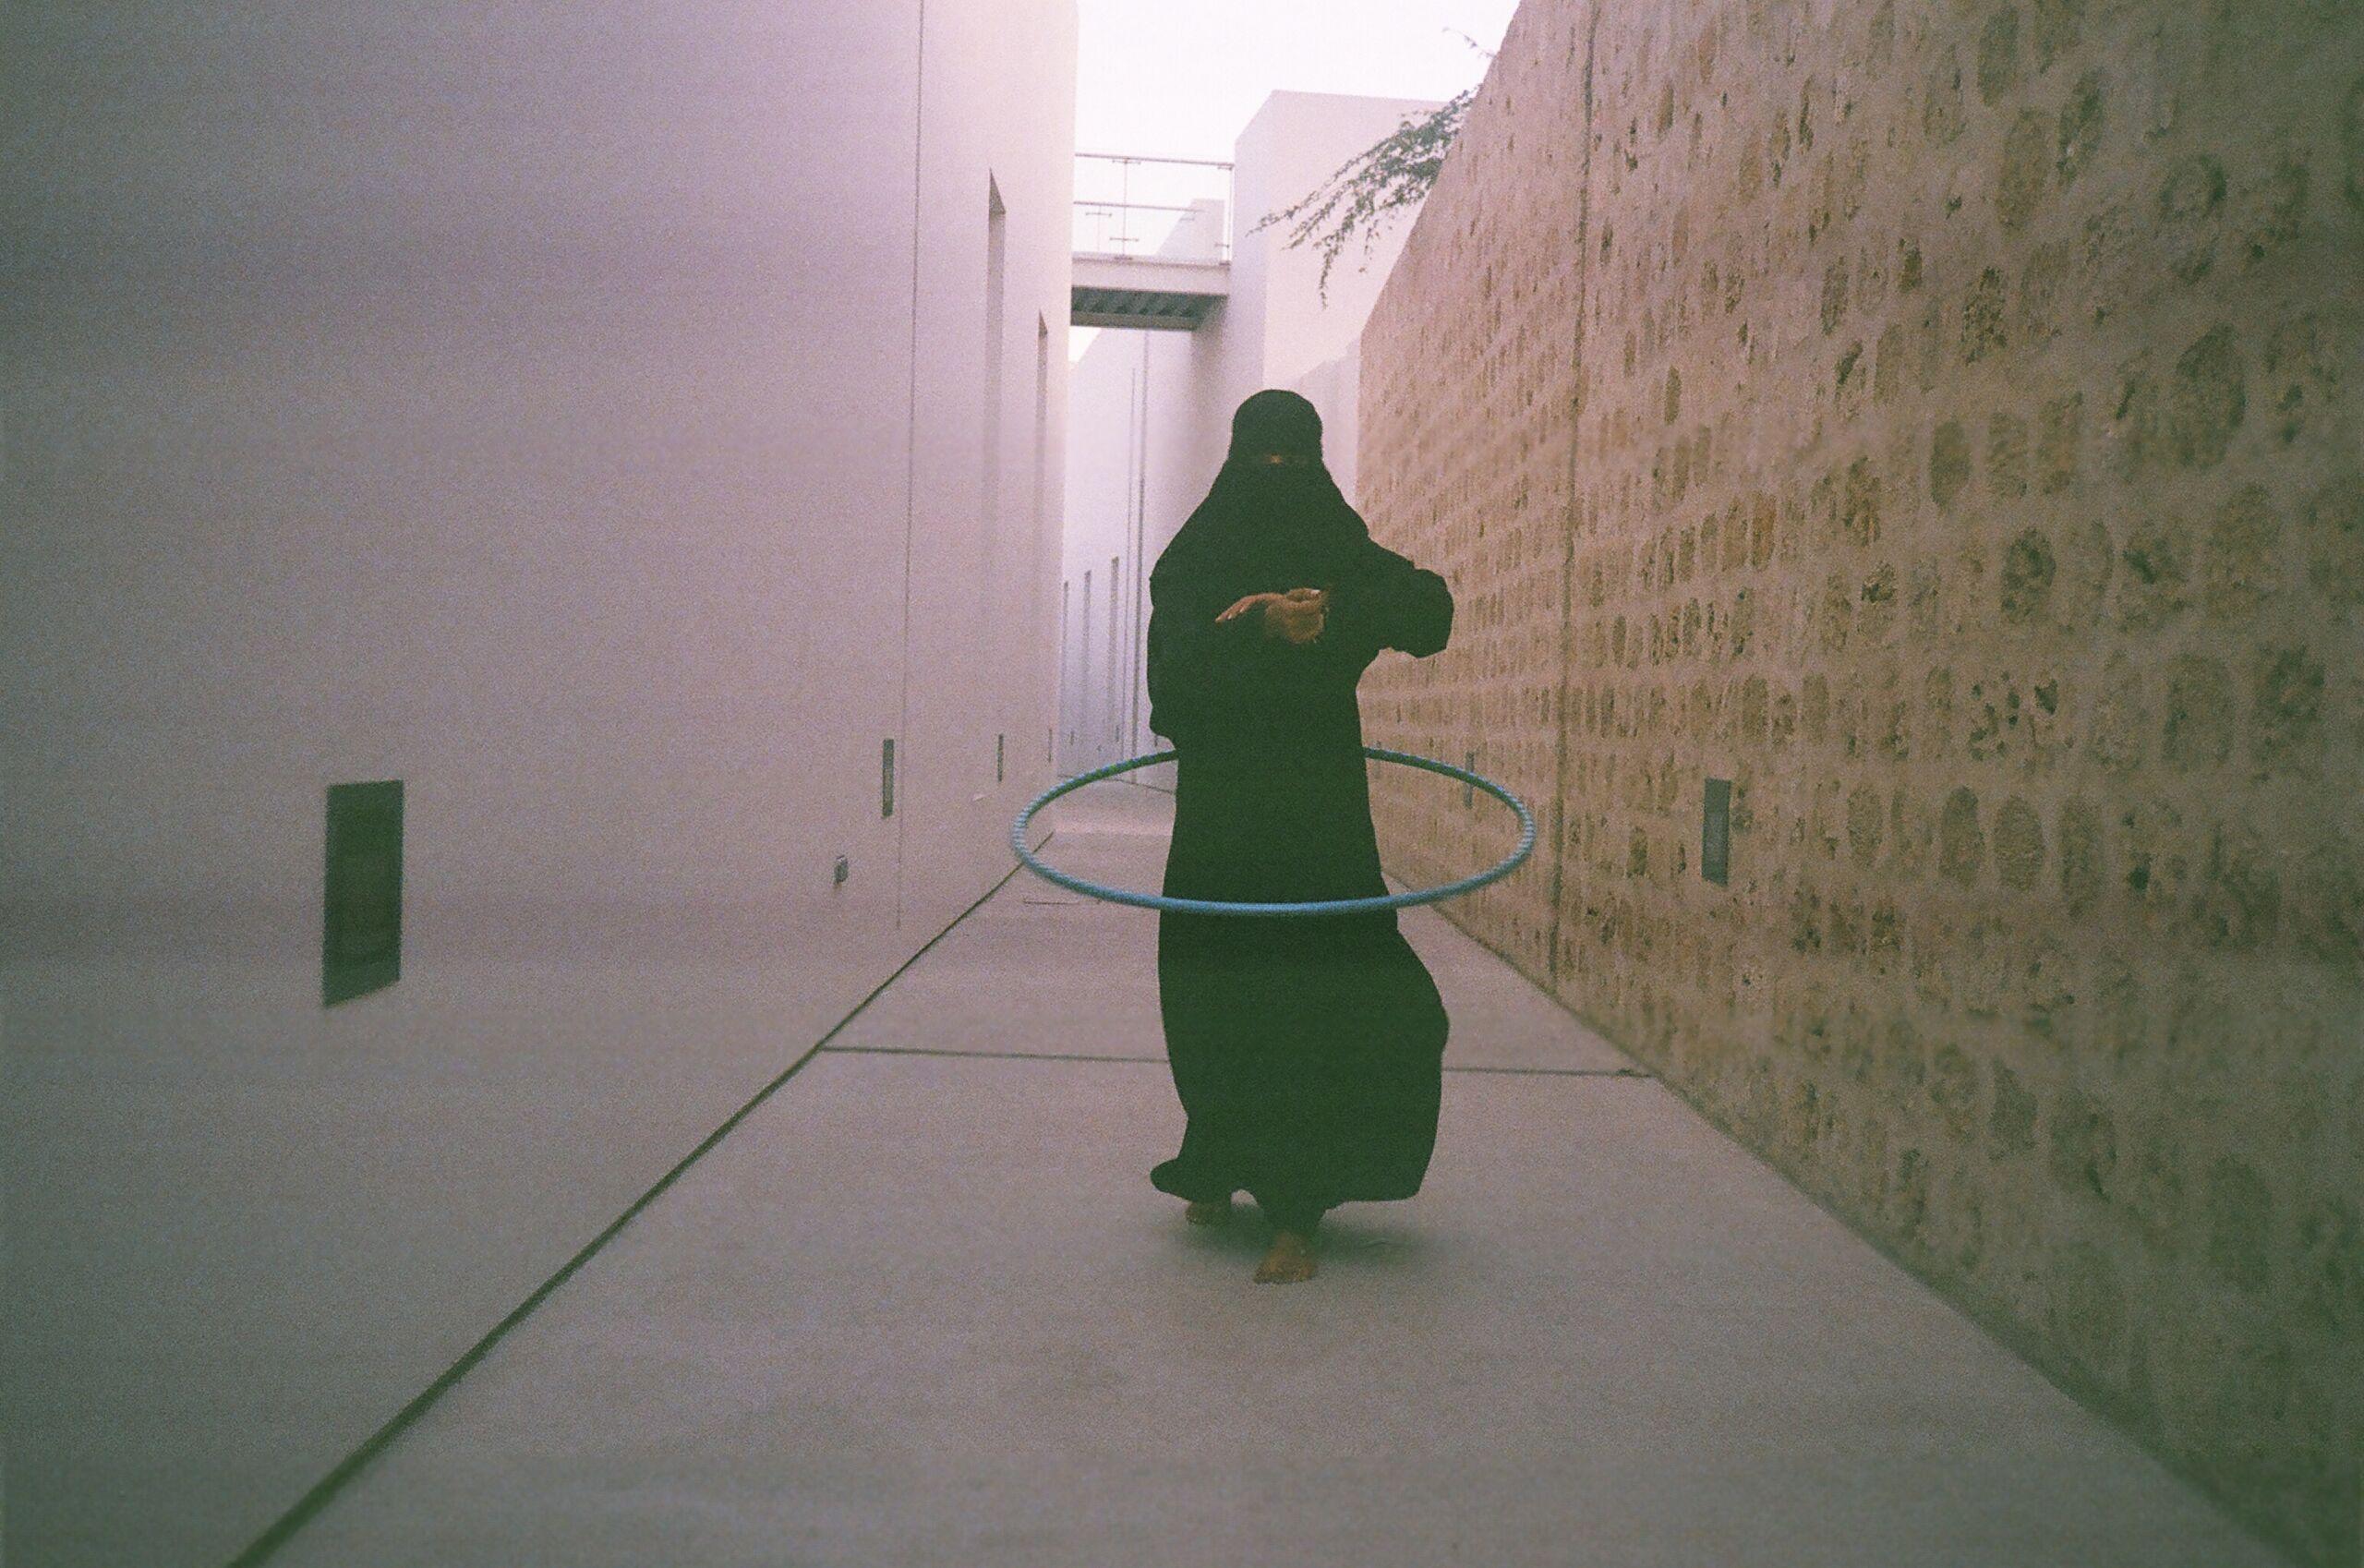 A woman hula hooping in a narrow street